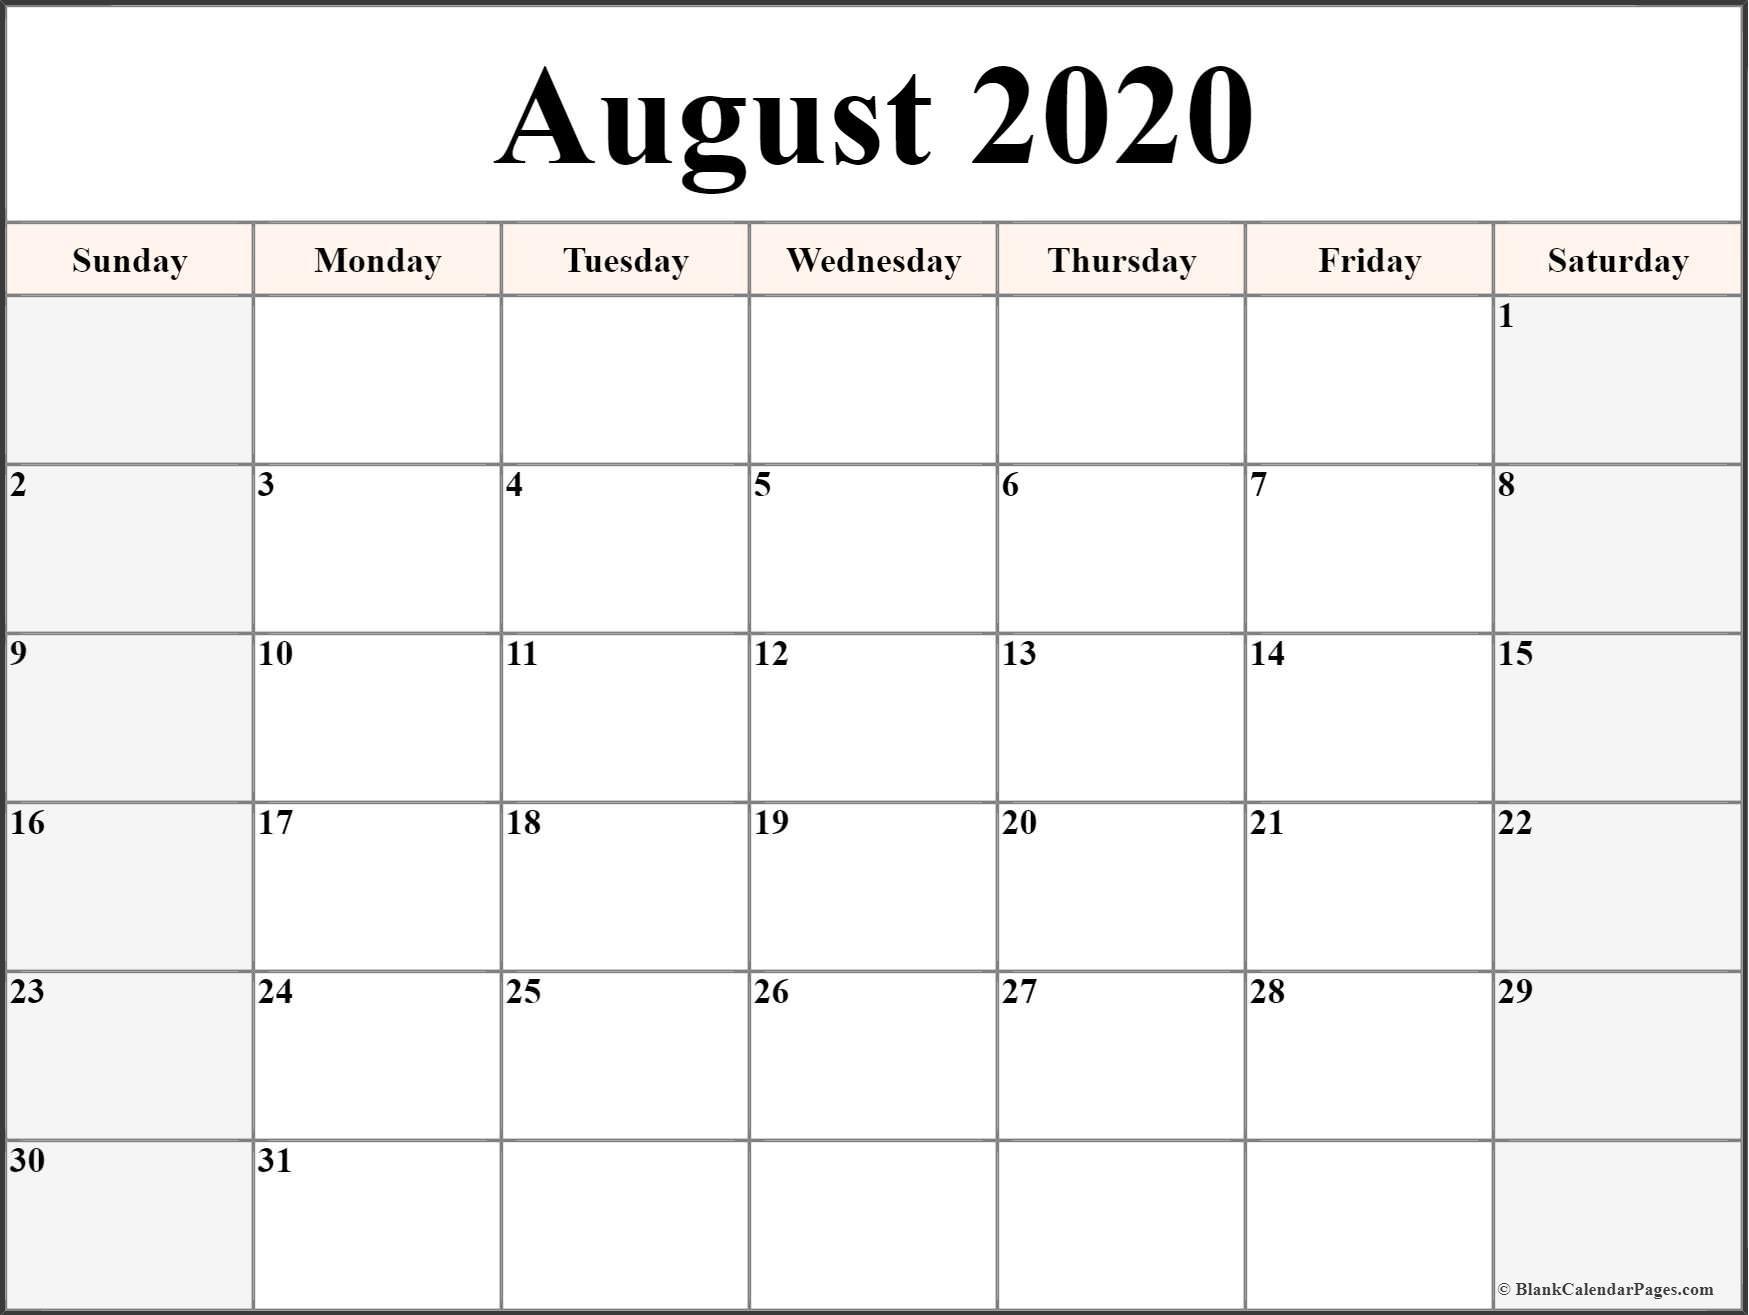 August 2020 Calendar | Free Printable Monthly Calendars-Blank Calendar Template June July August 2020